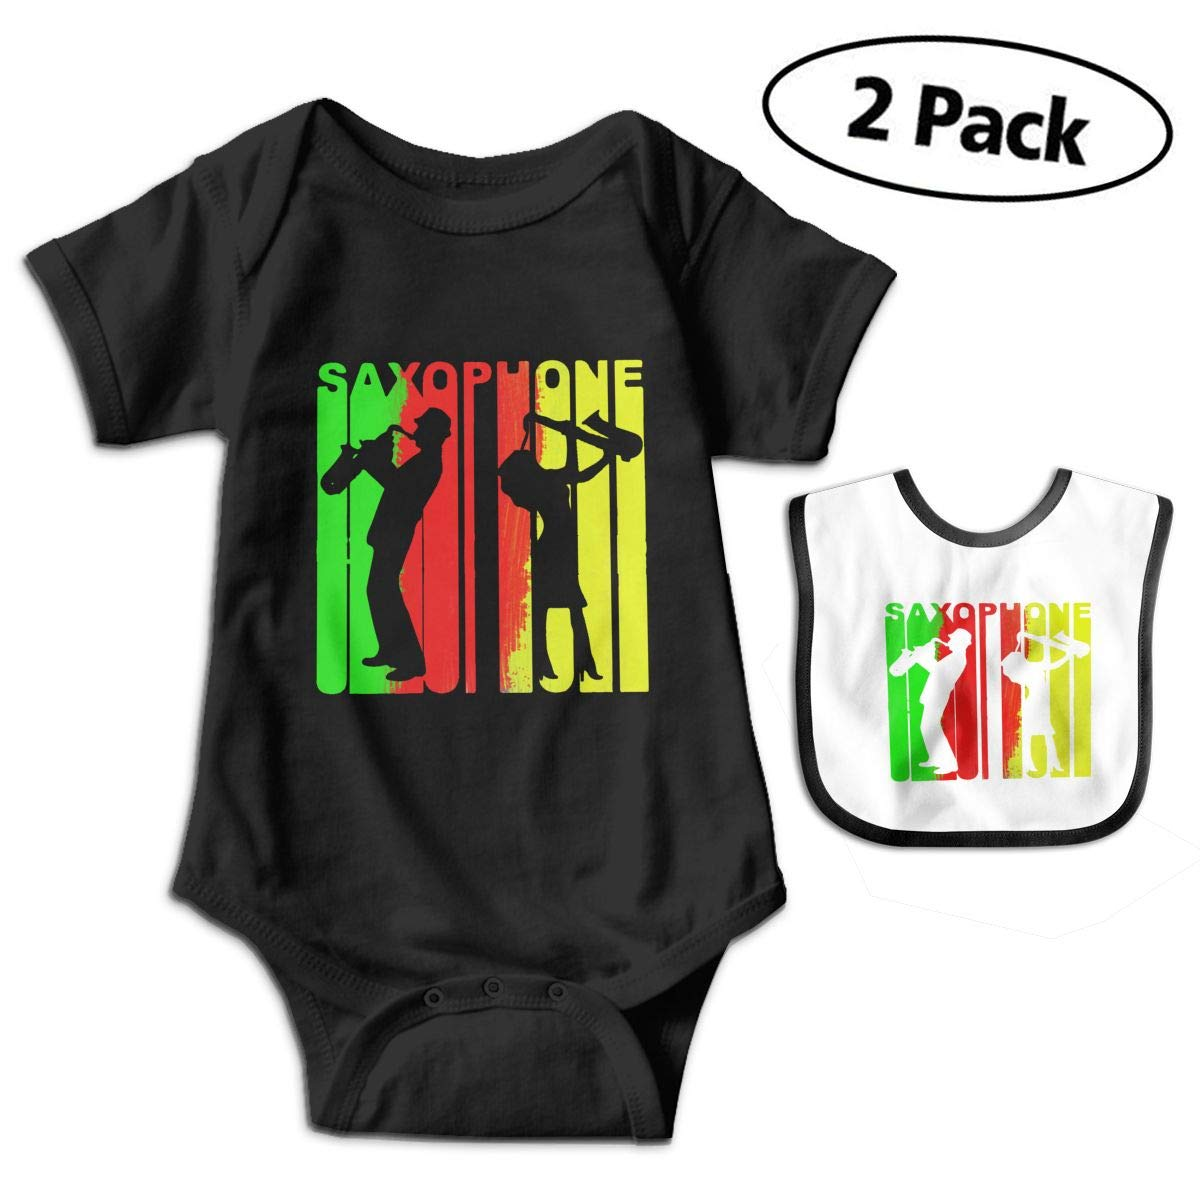 Harataki Retro 1970s Style Saxophone Player Infant Baby Short Sleeve Romper Jumpsuit Bodysuit